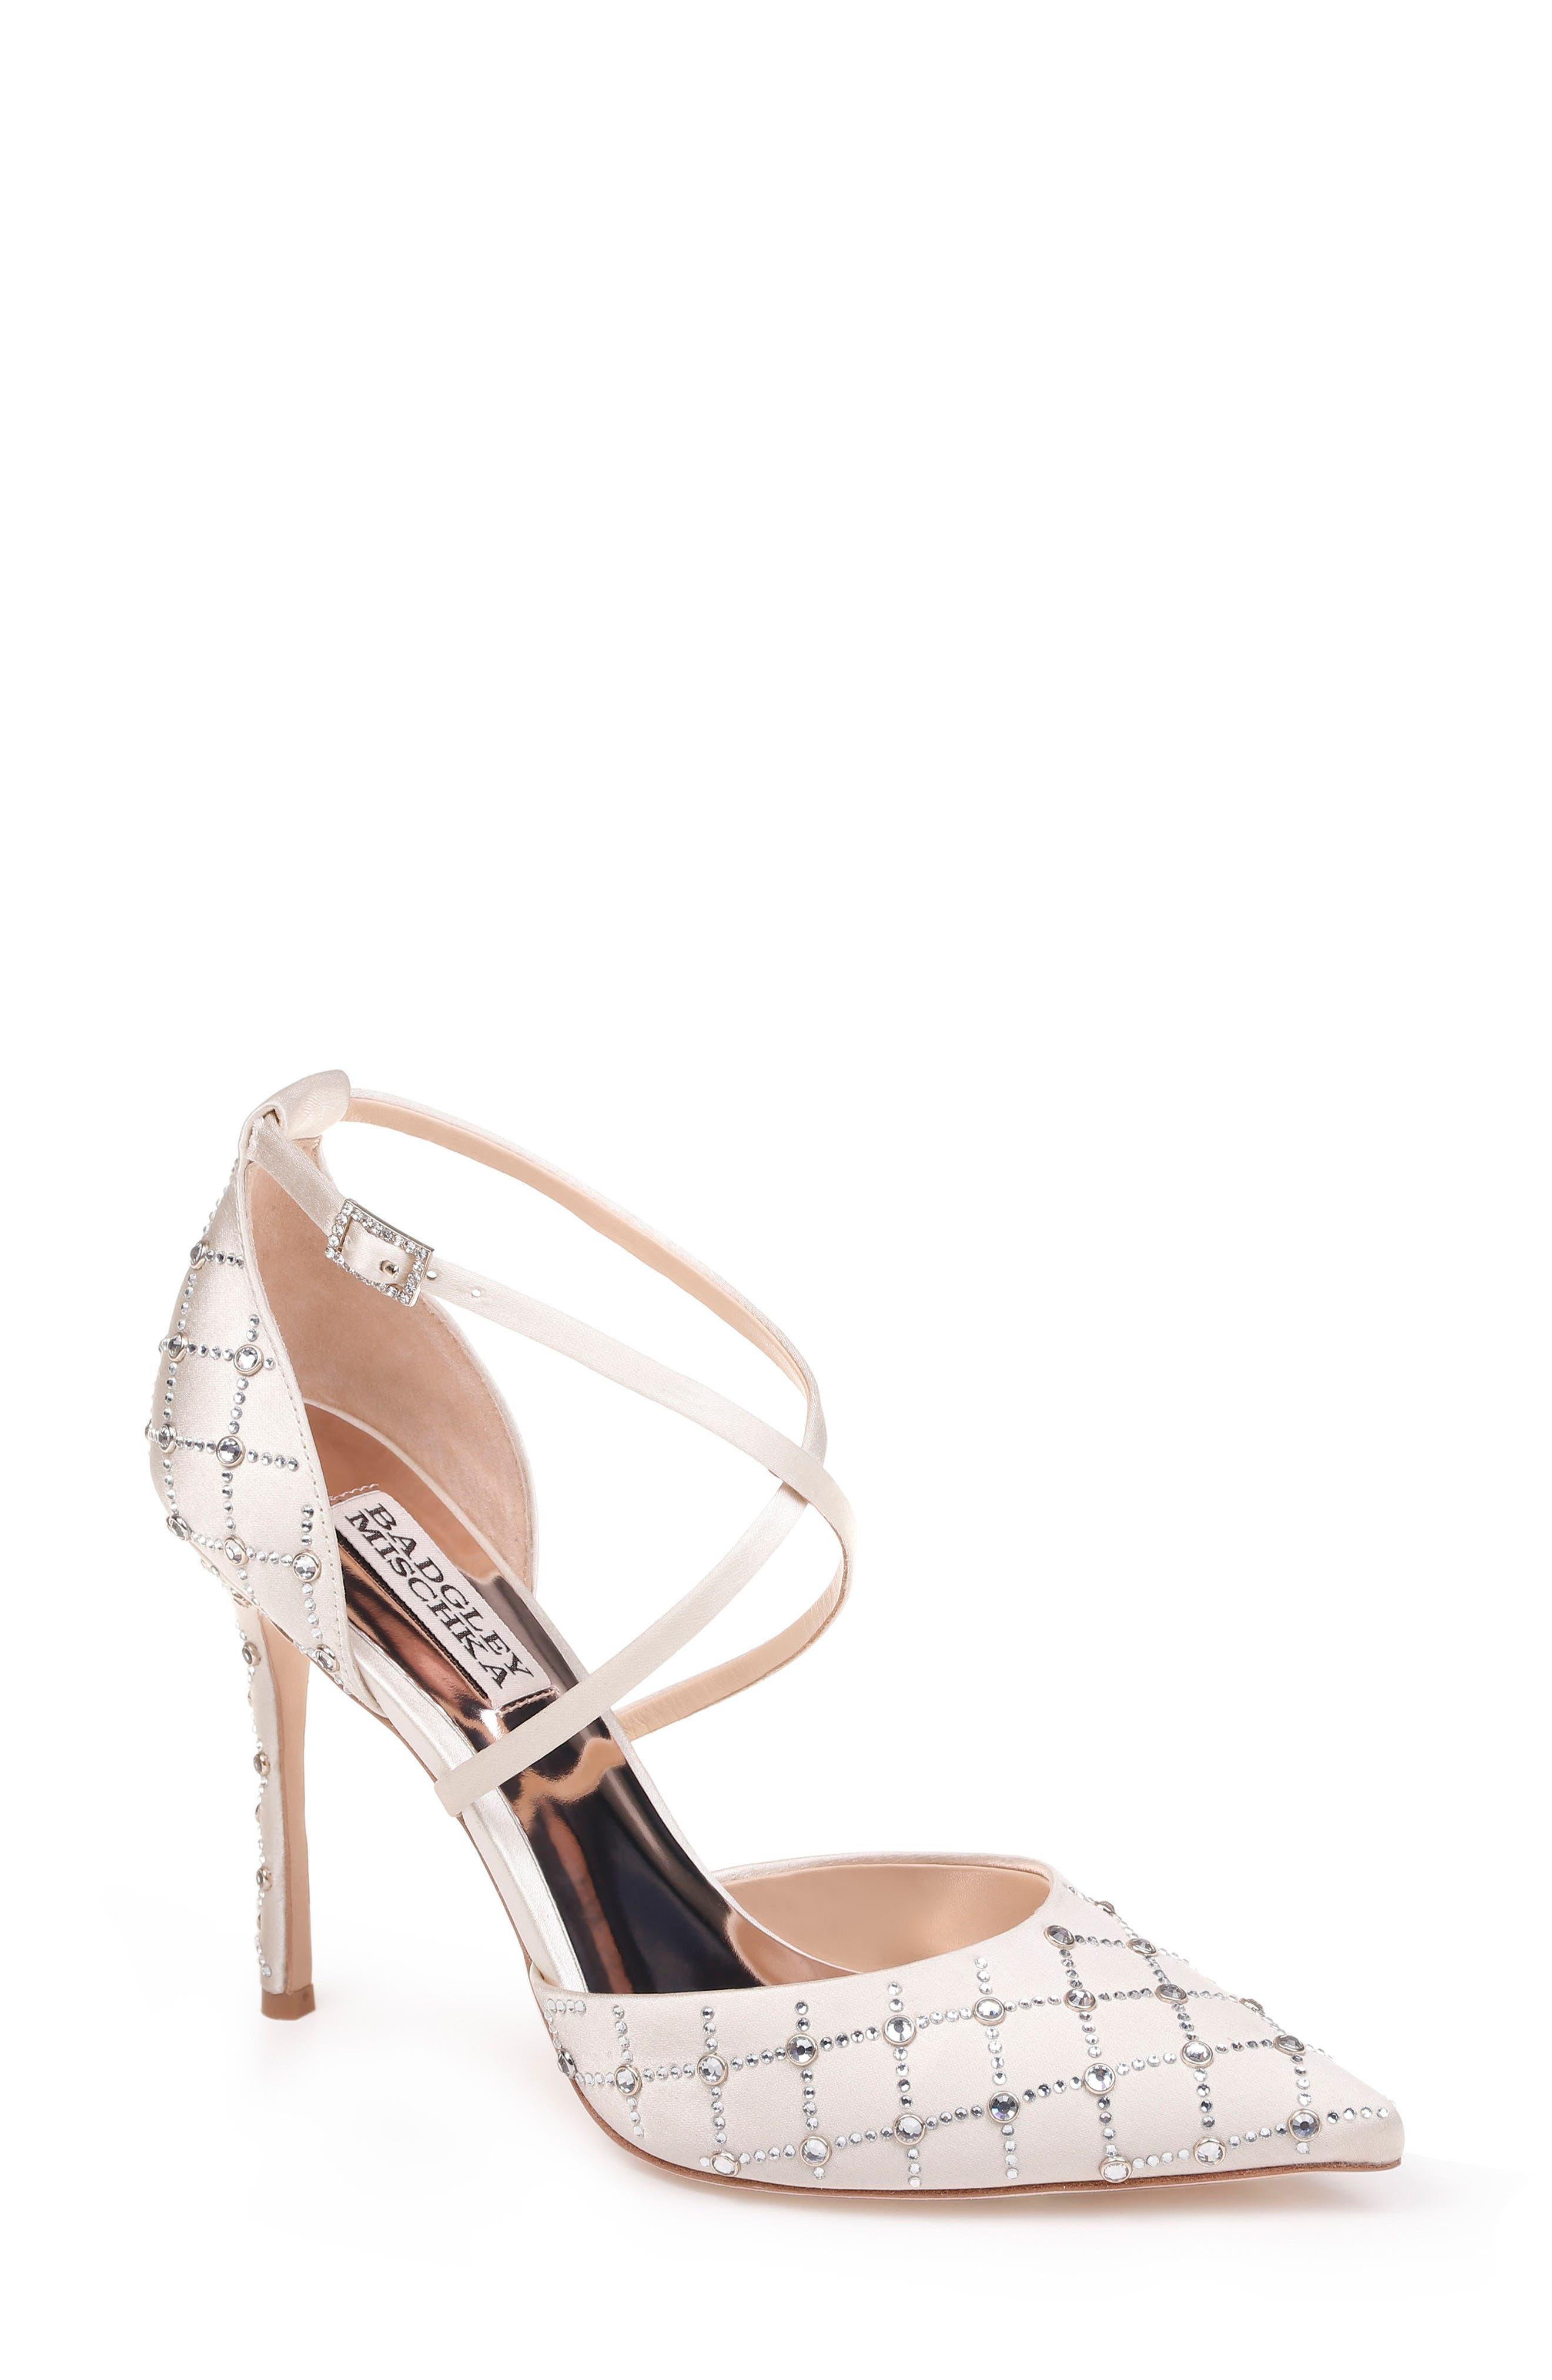 20182017 Sandals Badgley Mischka Womens Allie Dress Sandal Outlet Online Sale